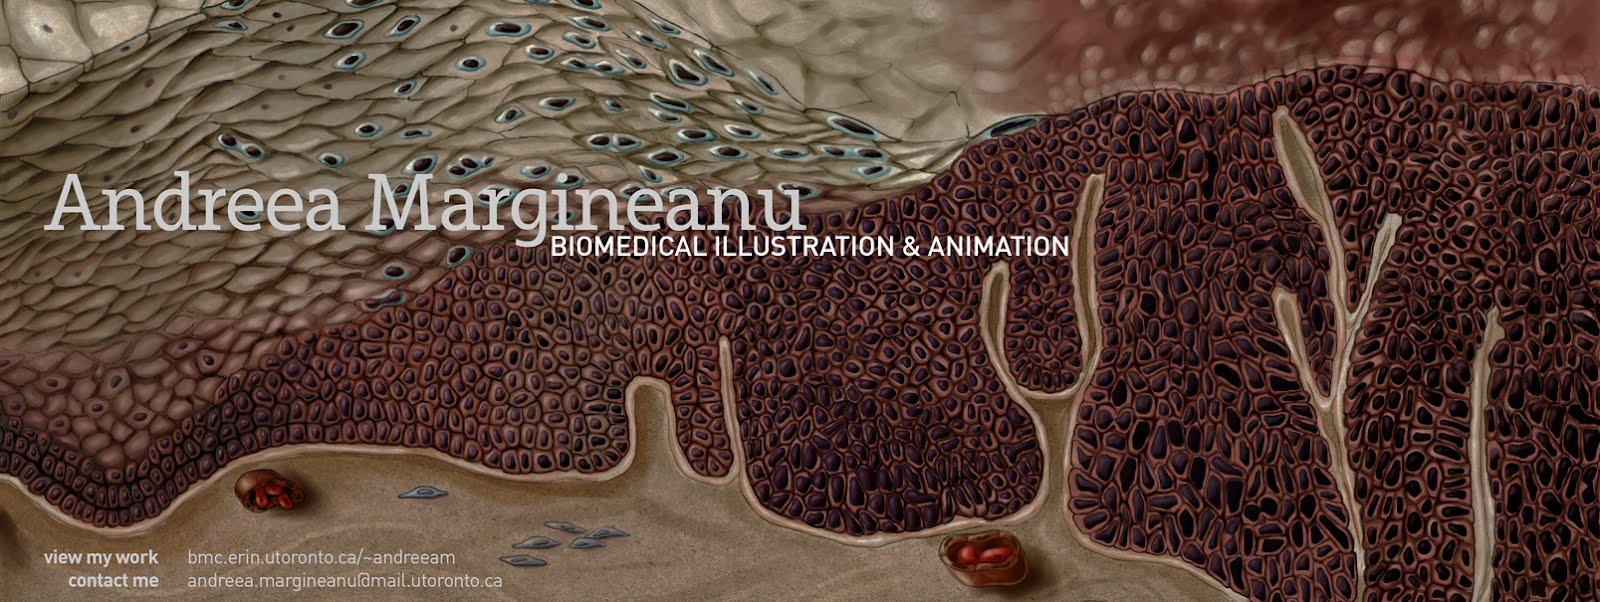 andreea margineanu: biomedical illustration and animation